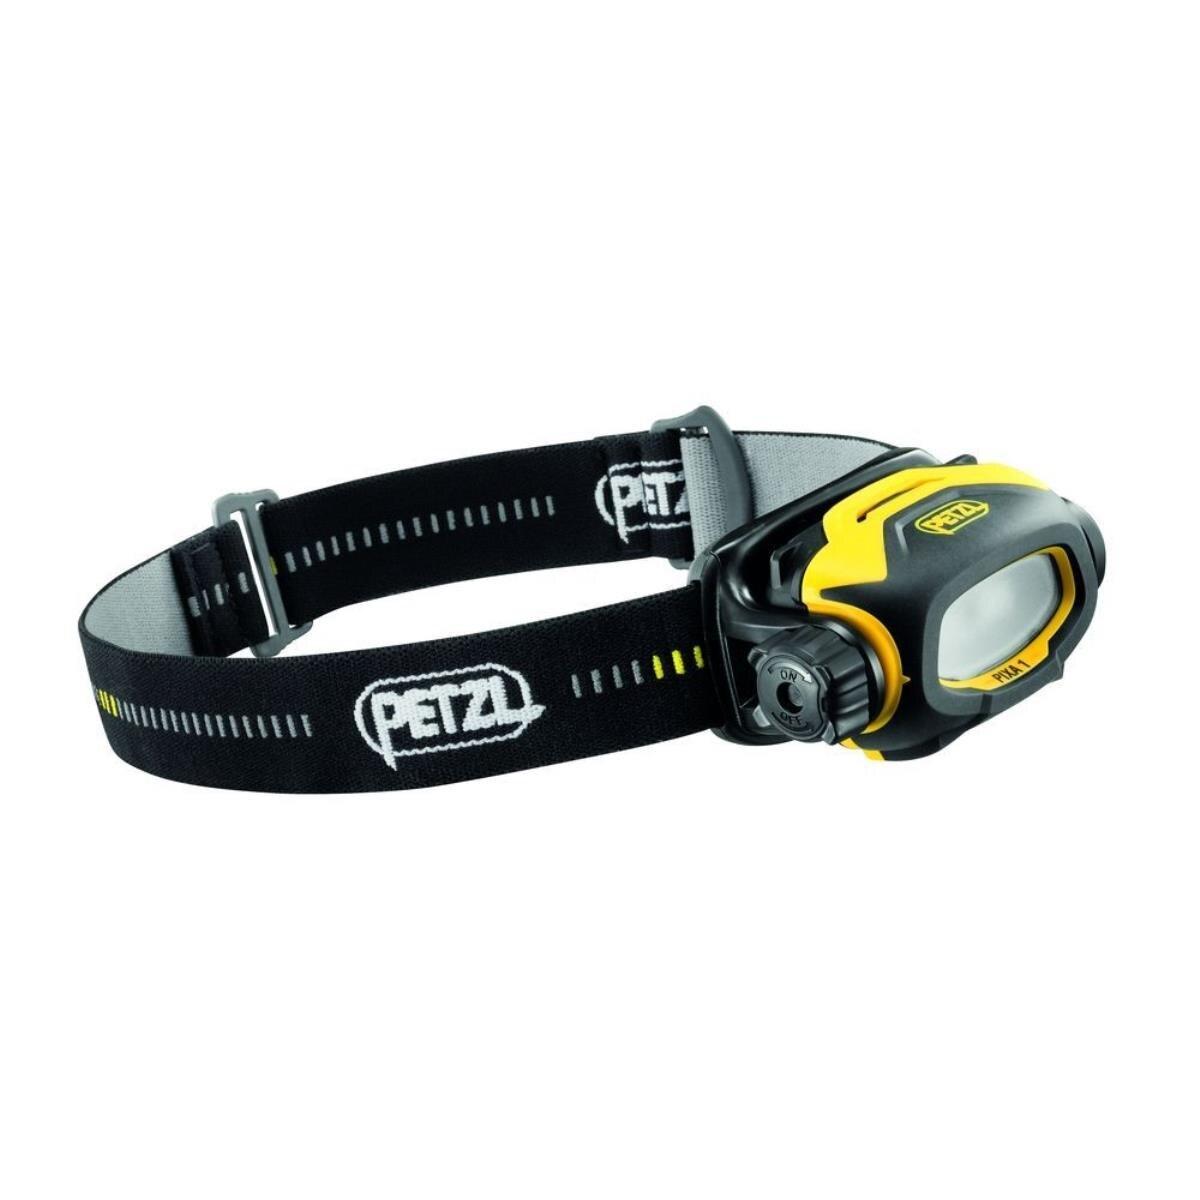 Lantern Headlamp Pixa 1 Black/yellow Petzl (e78ahb)